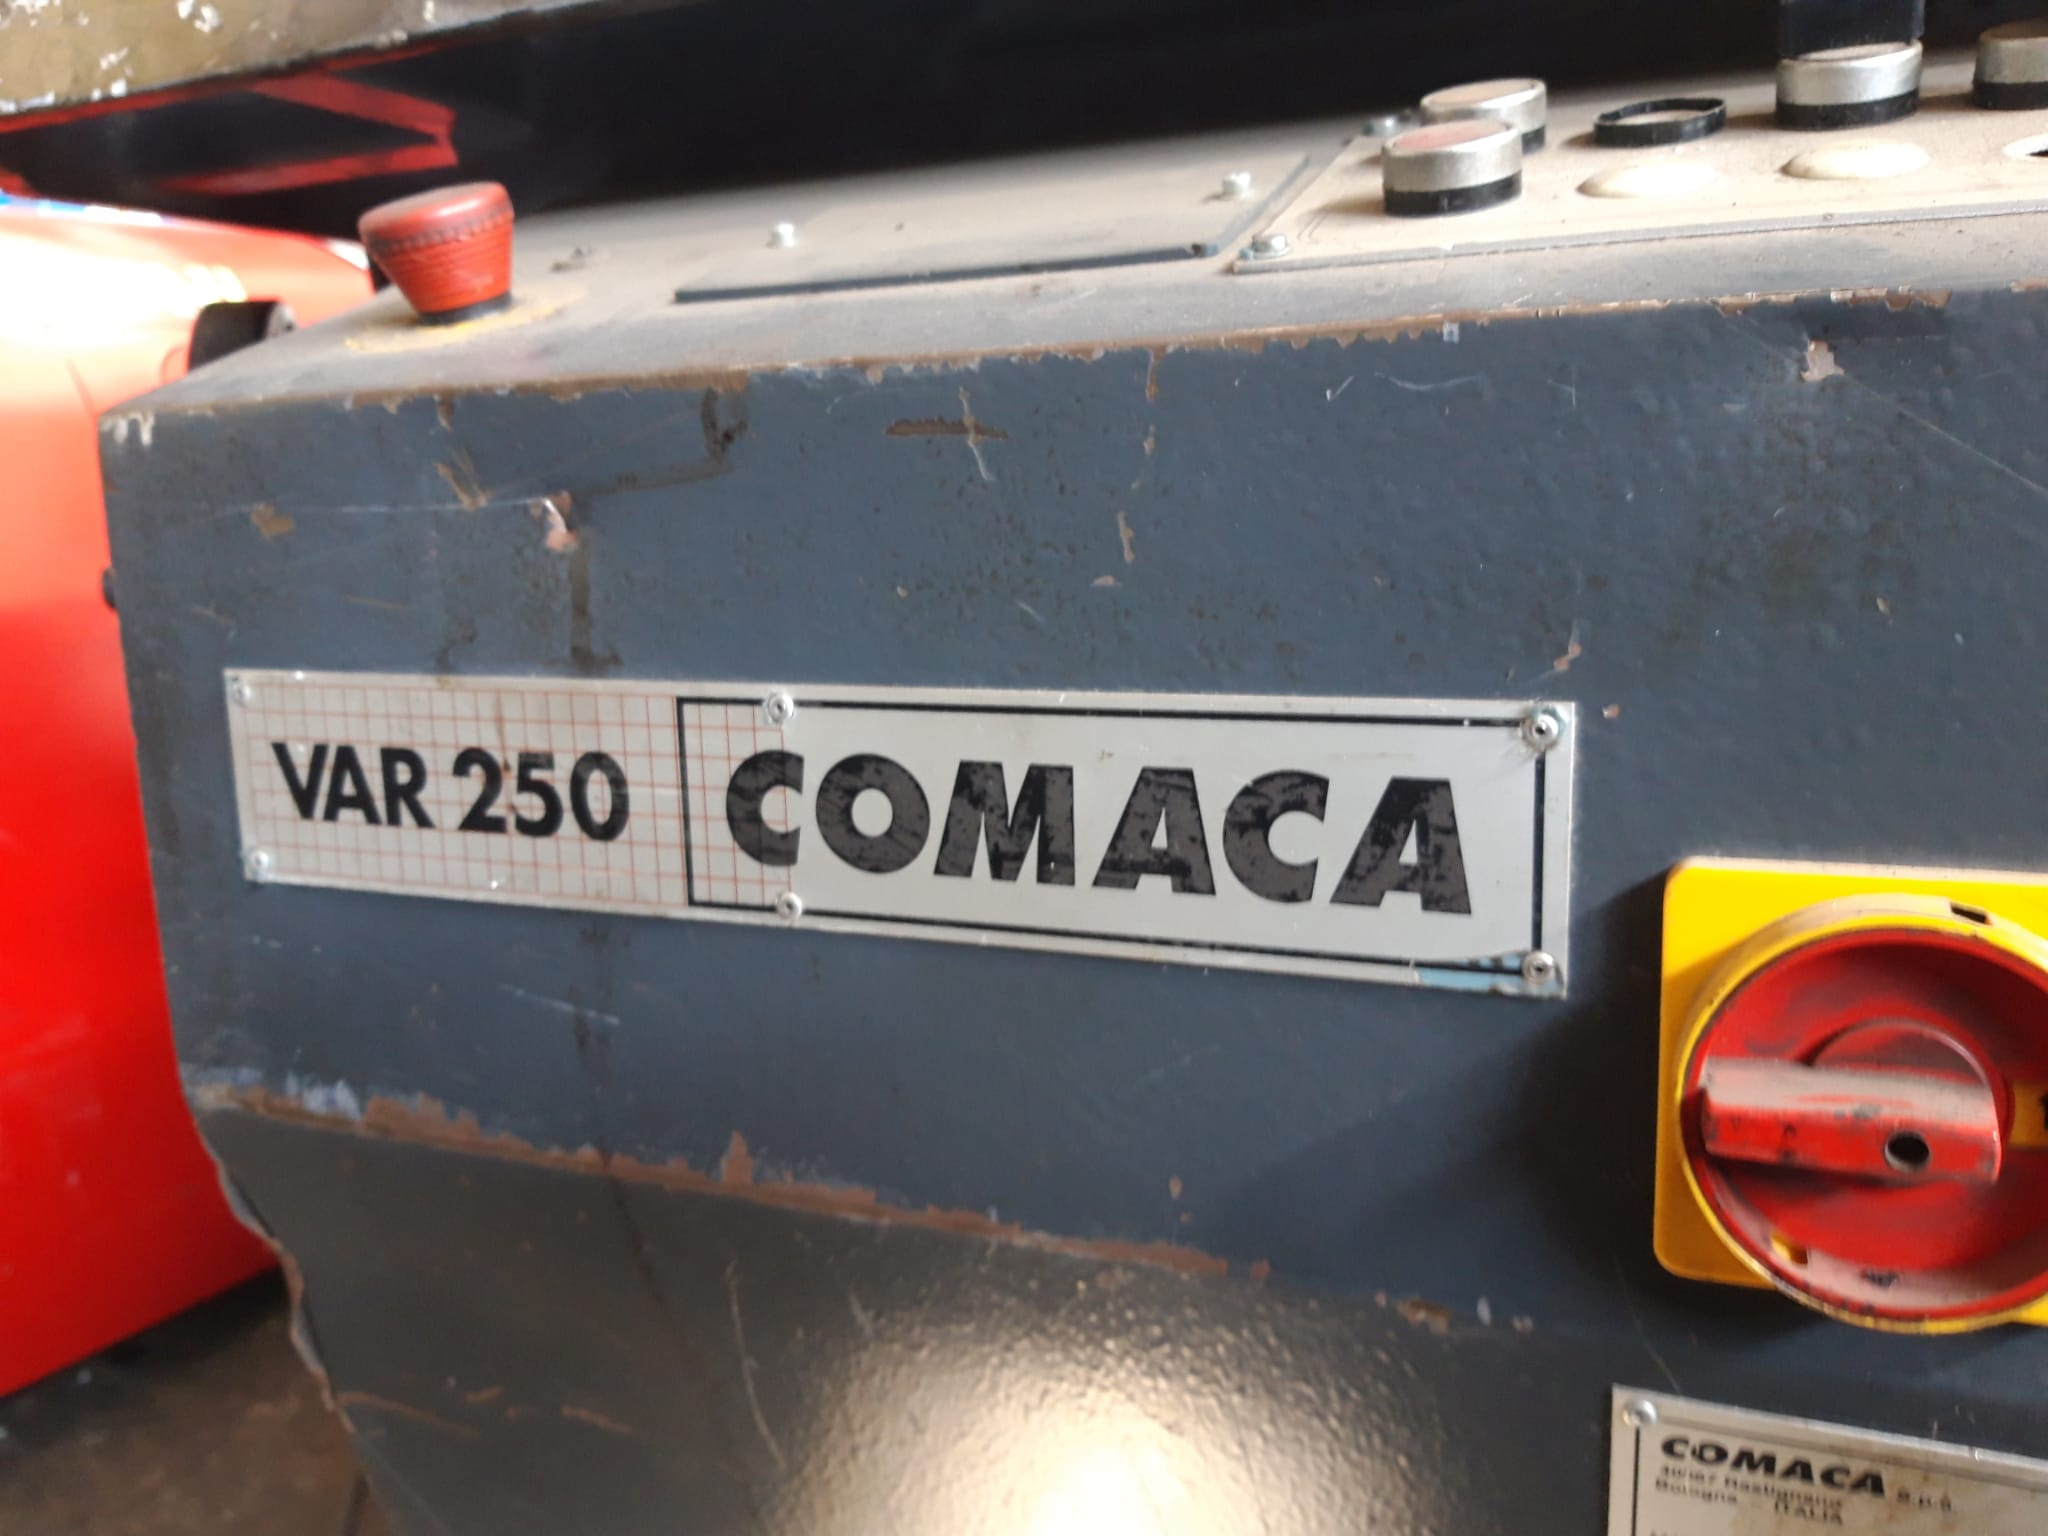 Scantonatrice idraulica Comaca var 250 in vendita - foto 4